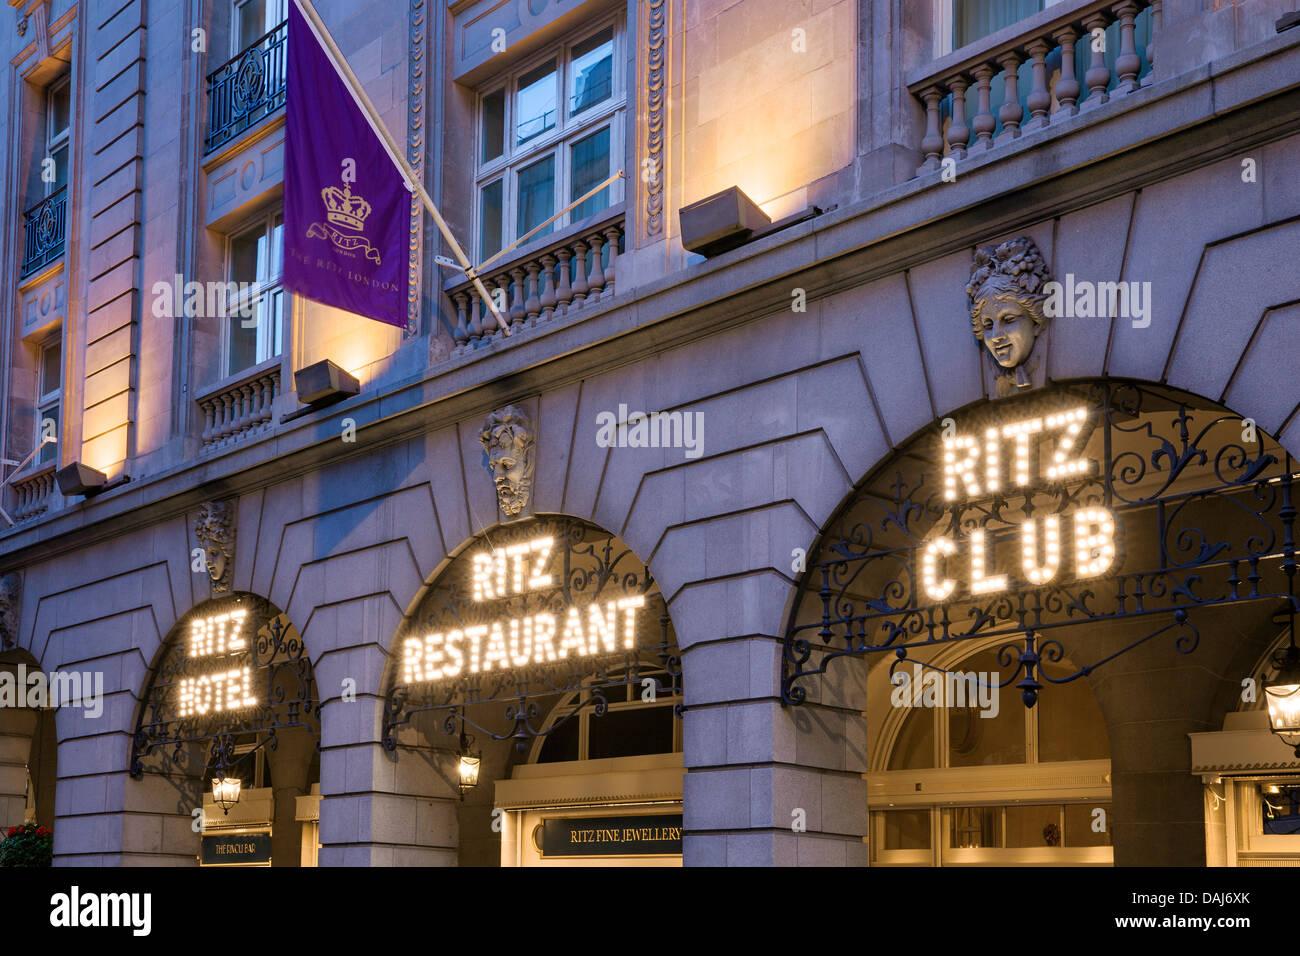 The Ritz London, London, United Kingdom. Architect: Charles Mewes & Arthur Davis, 1906. View of the Ritz Hotel, Stock Photo